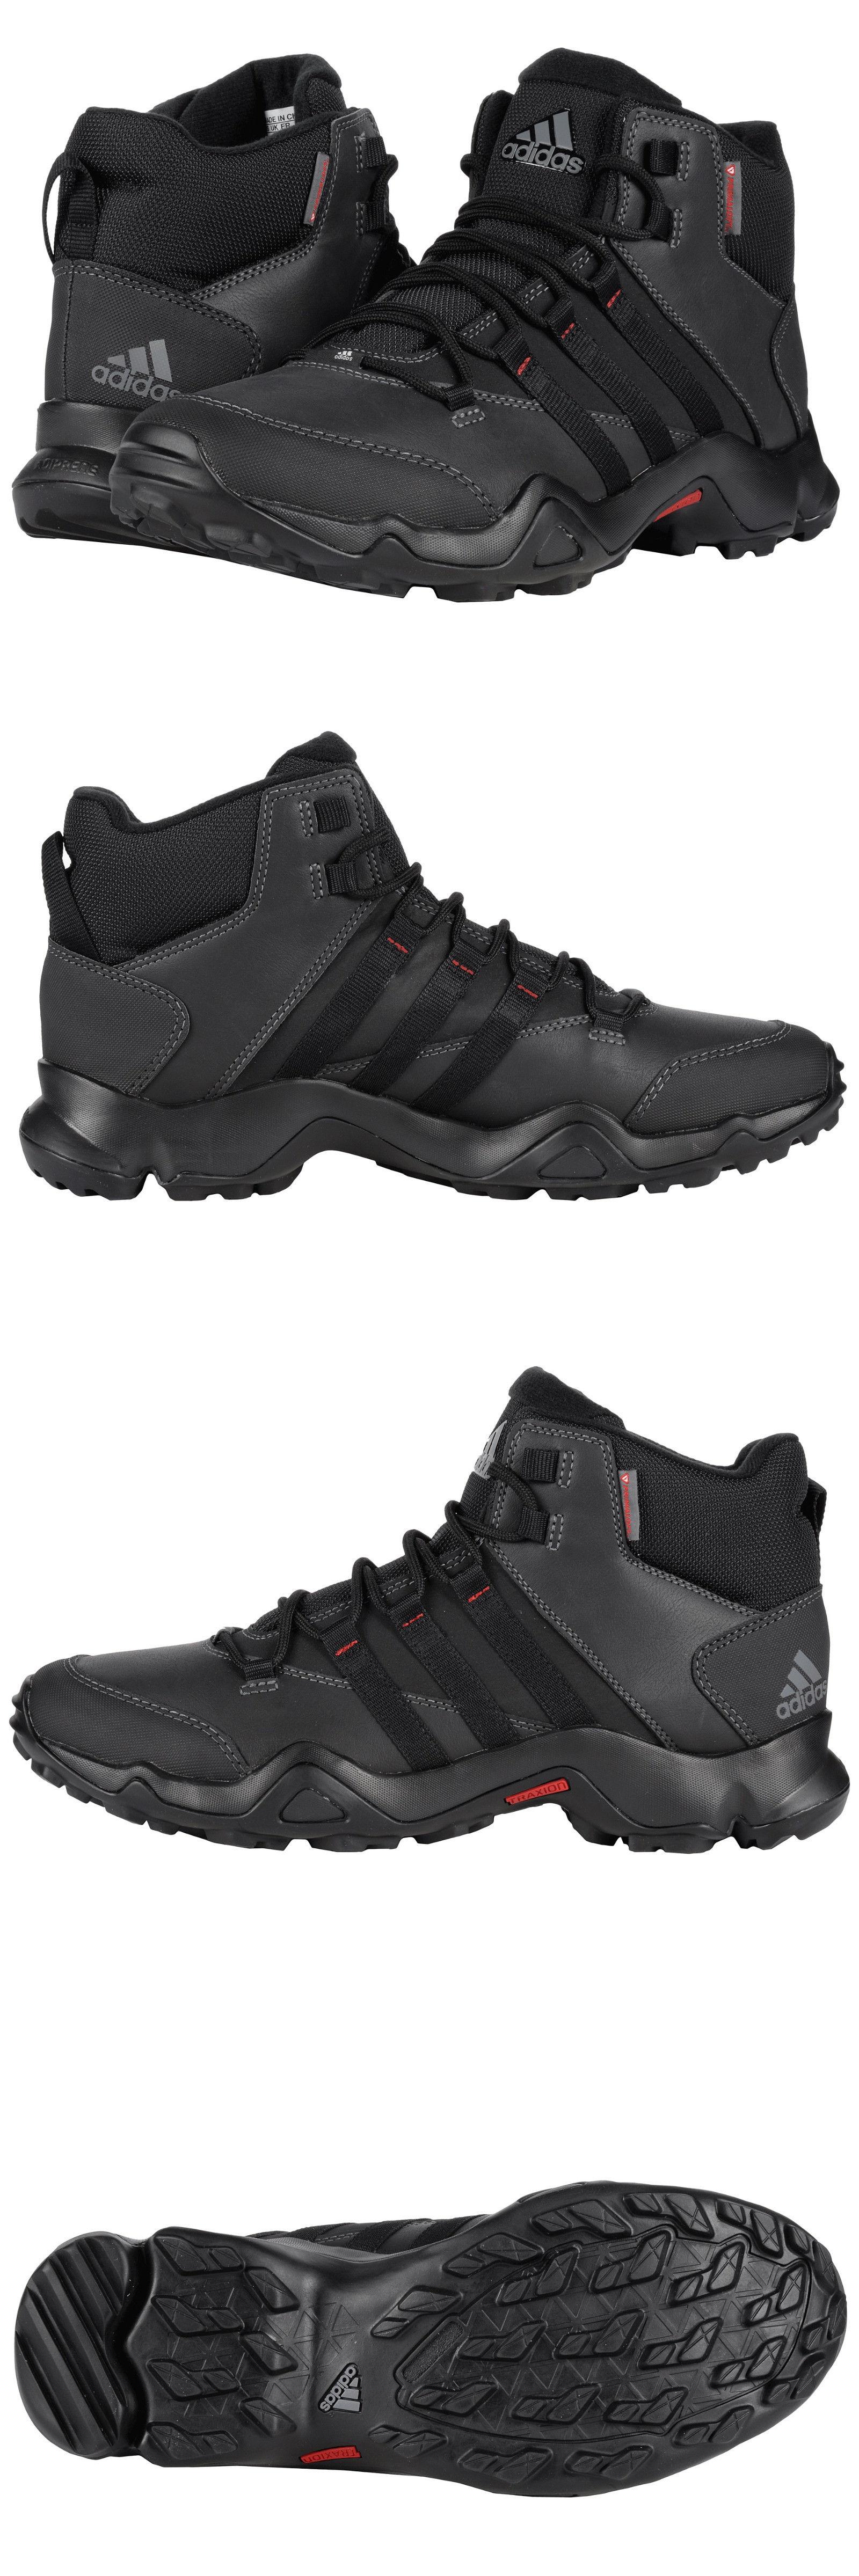 5571dffe99da6 Mens 181392  New Adidas Outdoor Cw Ax2 Beta Mid Primaloft Boots Hiking  Streets Men 9